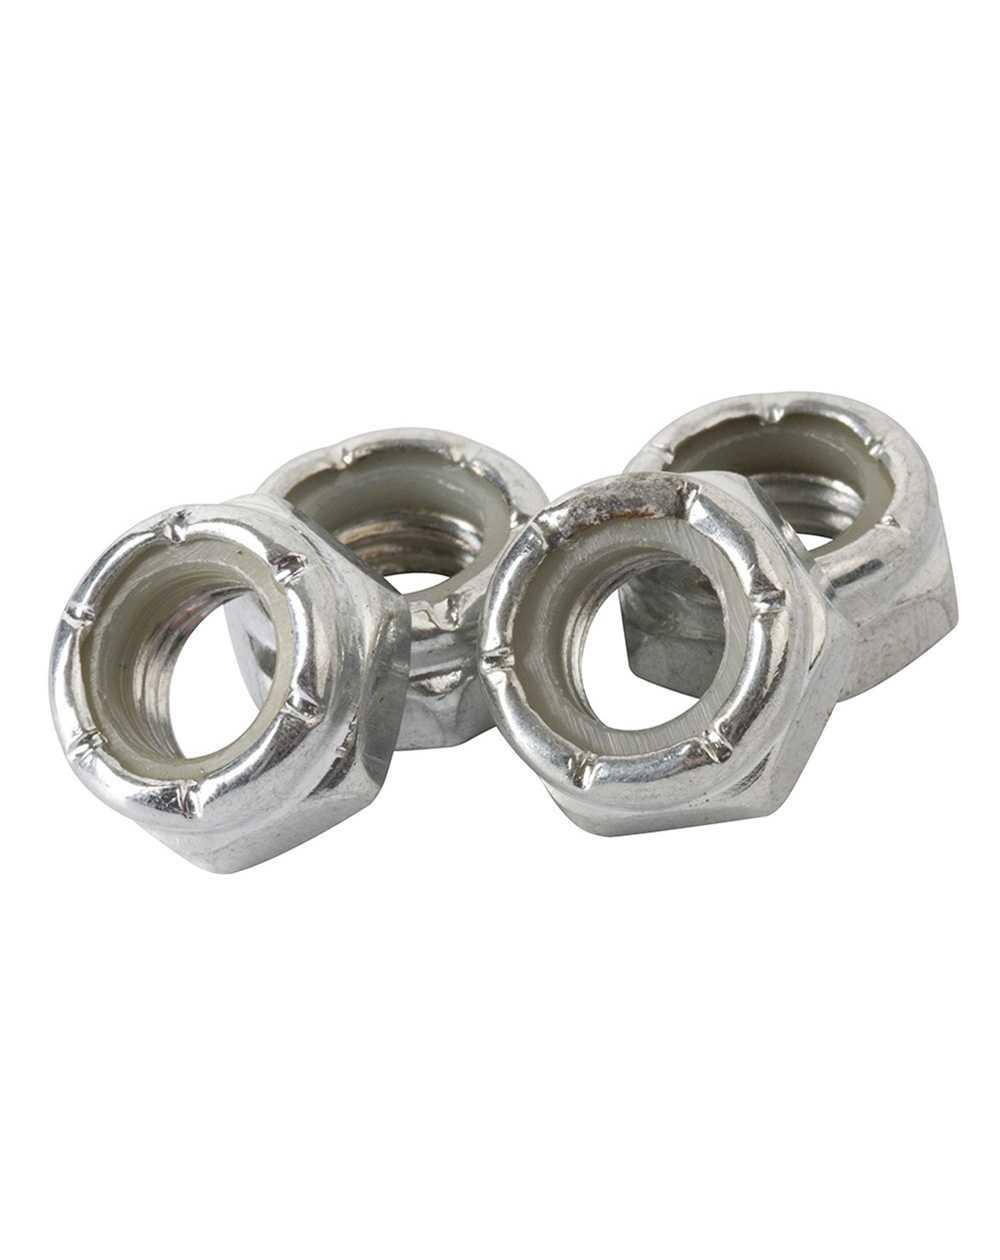 Enuff Bulloni Ruote Axle Locking 4 pz